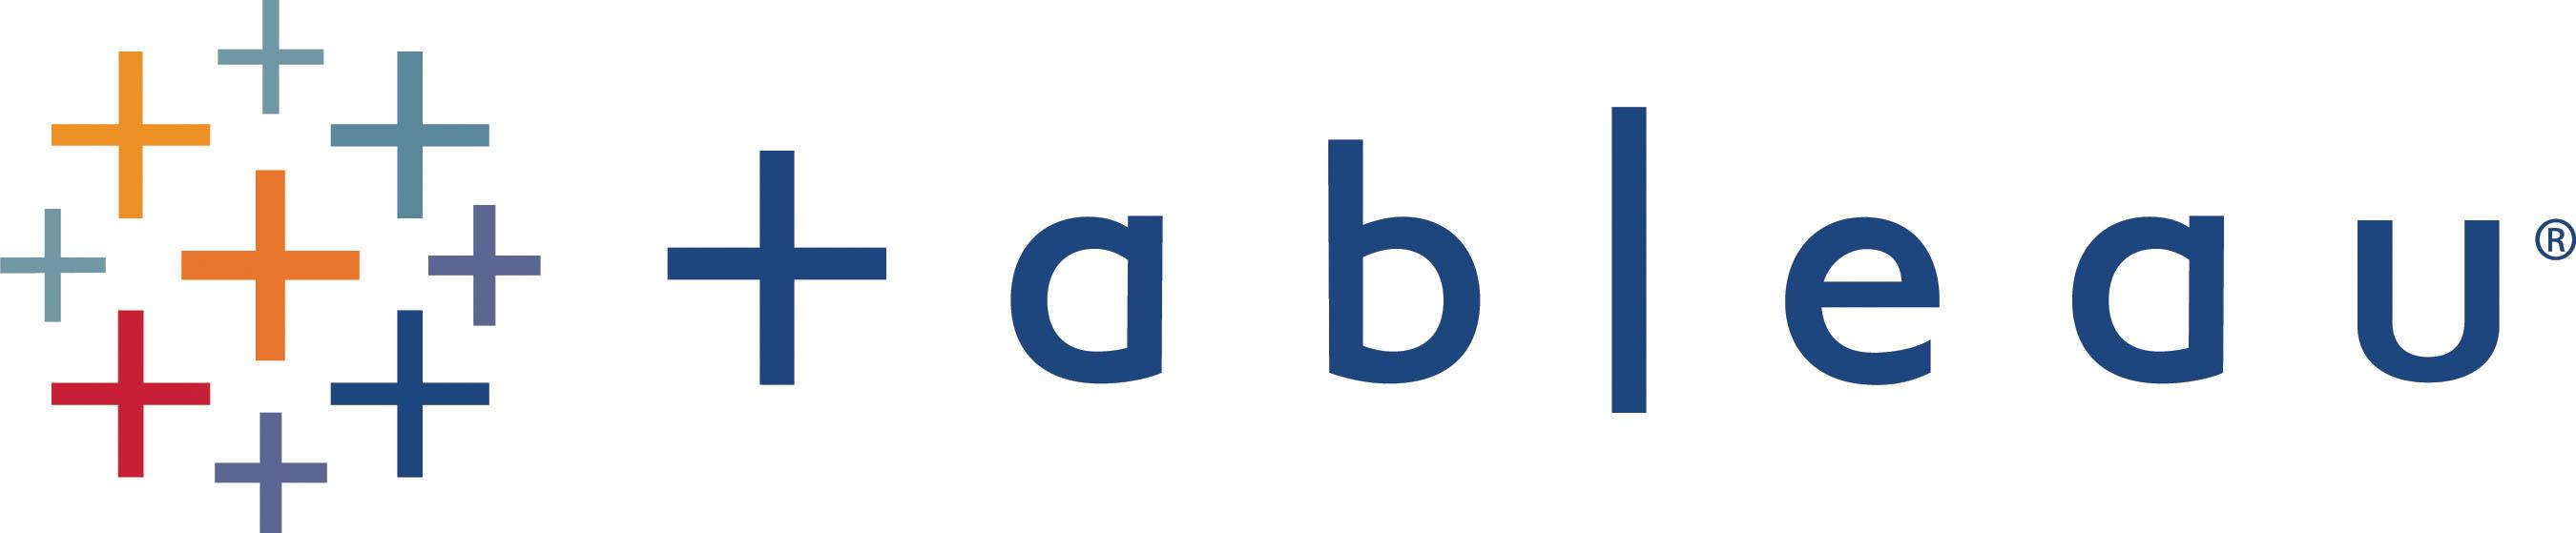 O Tableau Online 9.0 agiliza como nunca a análise na nuvem